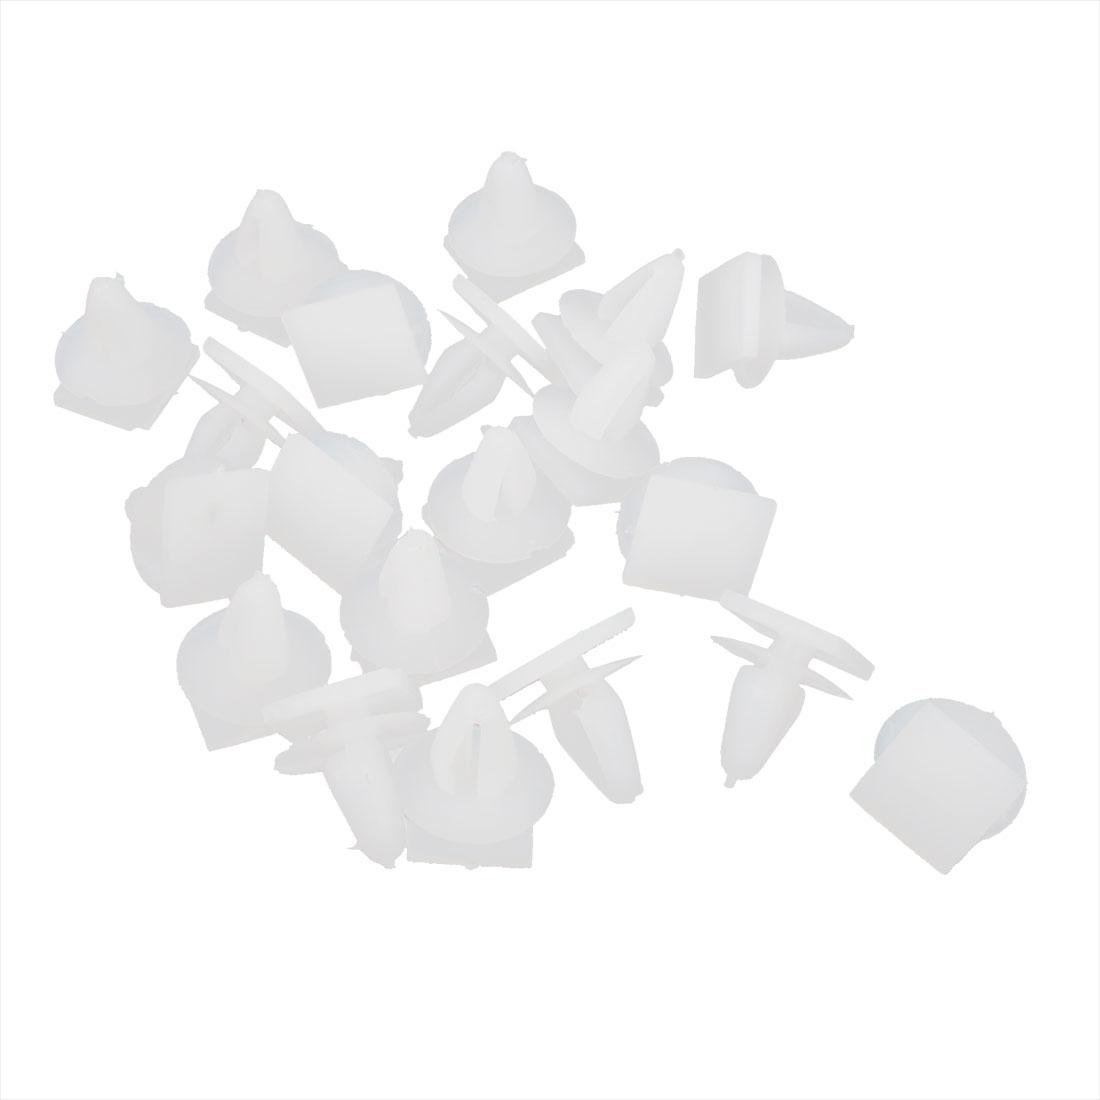 20 Pcs White Plastic Rivet 10mm x 12mm Expansion Panel Clips for Car